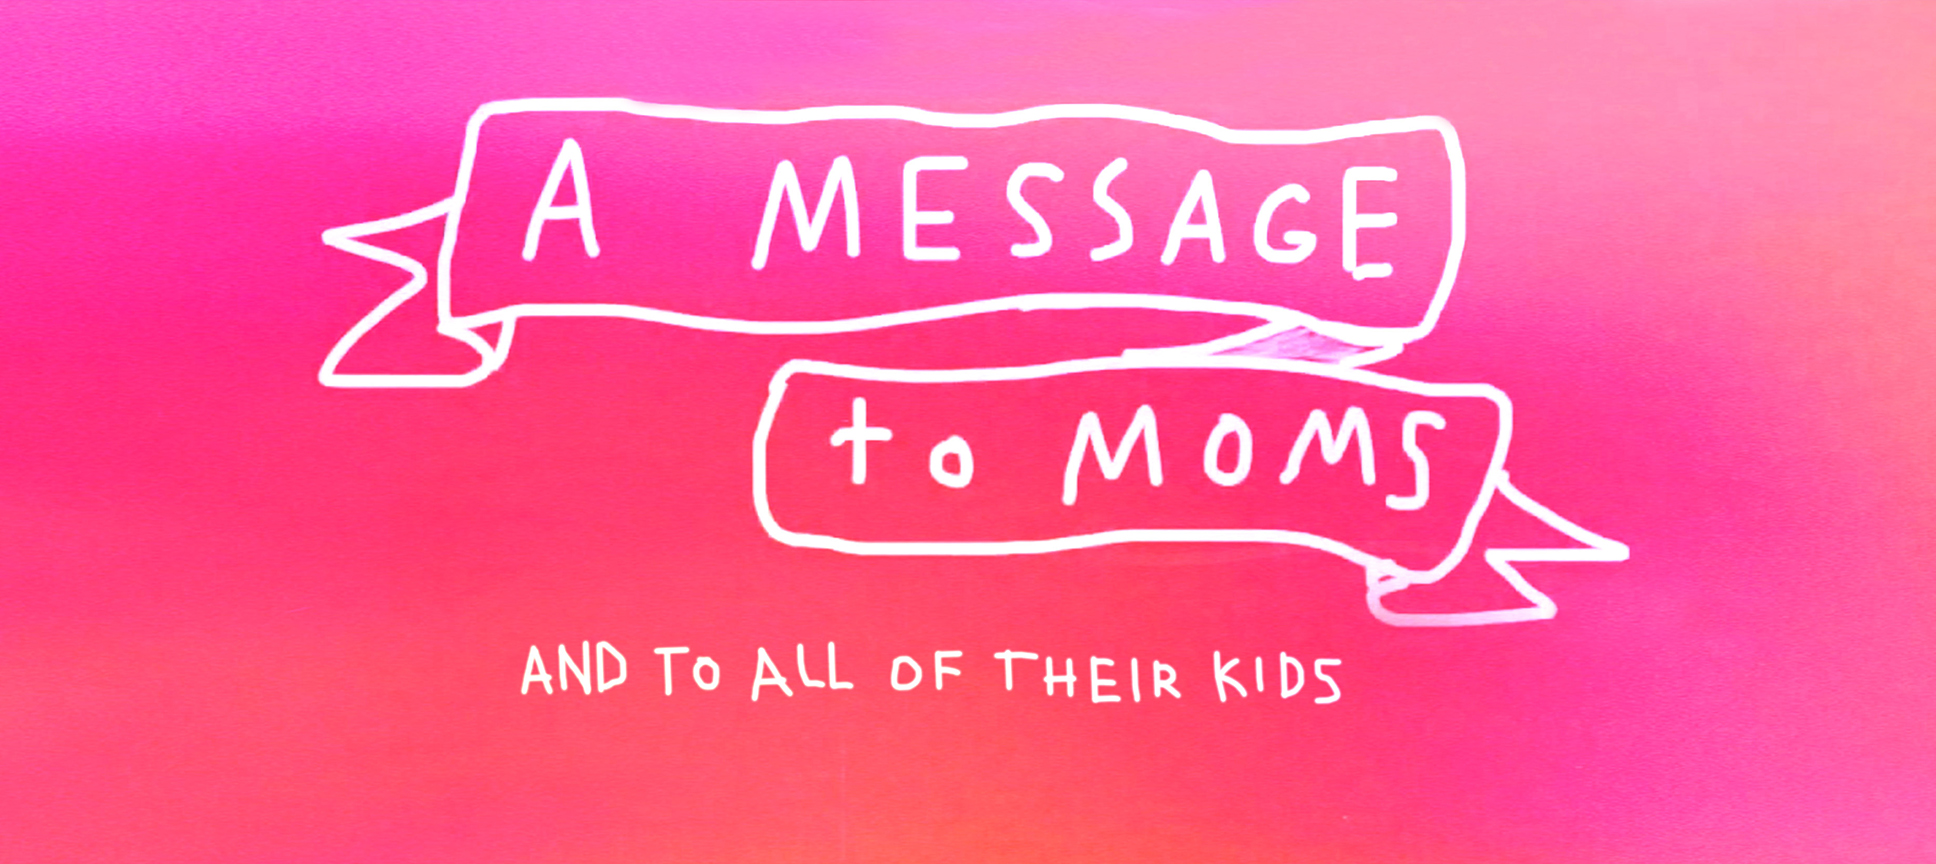 Mother's Day sermon website.jpg